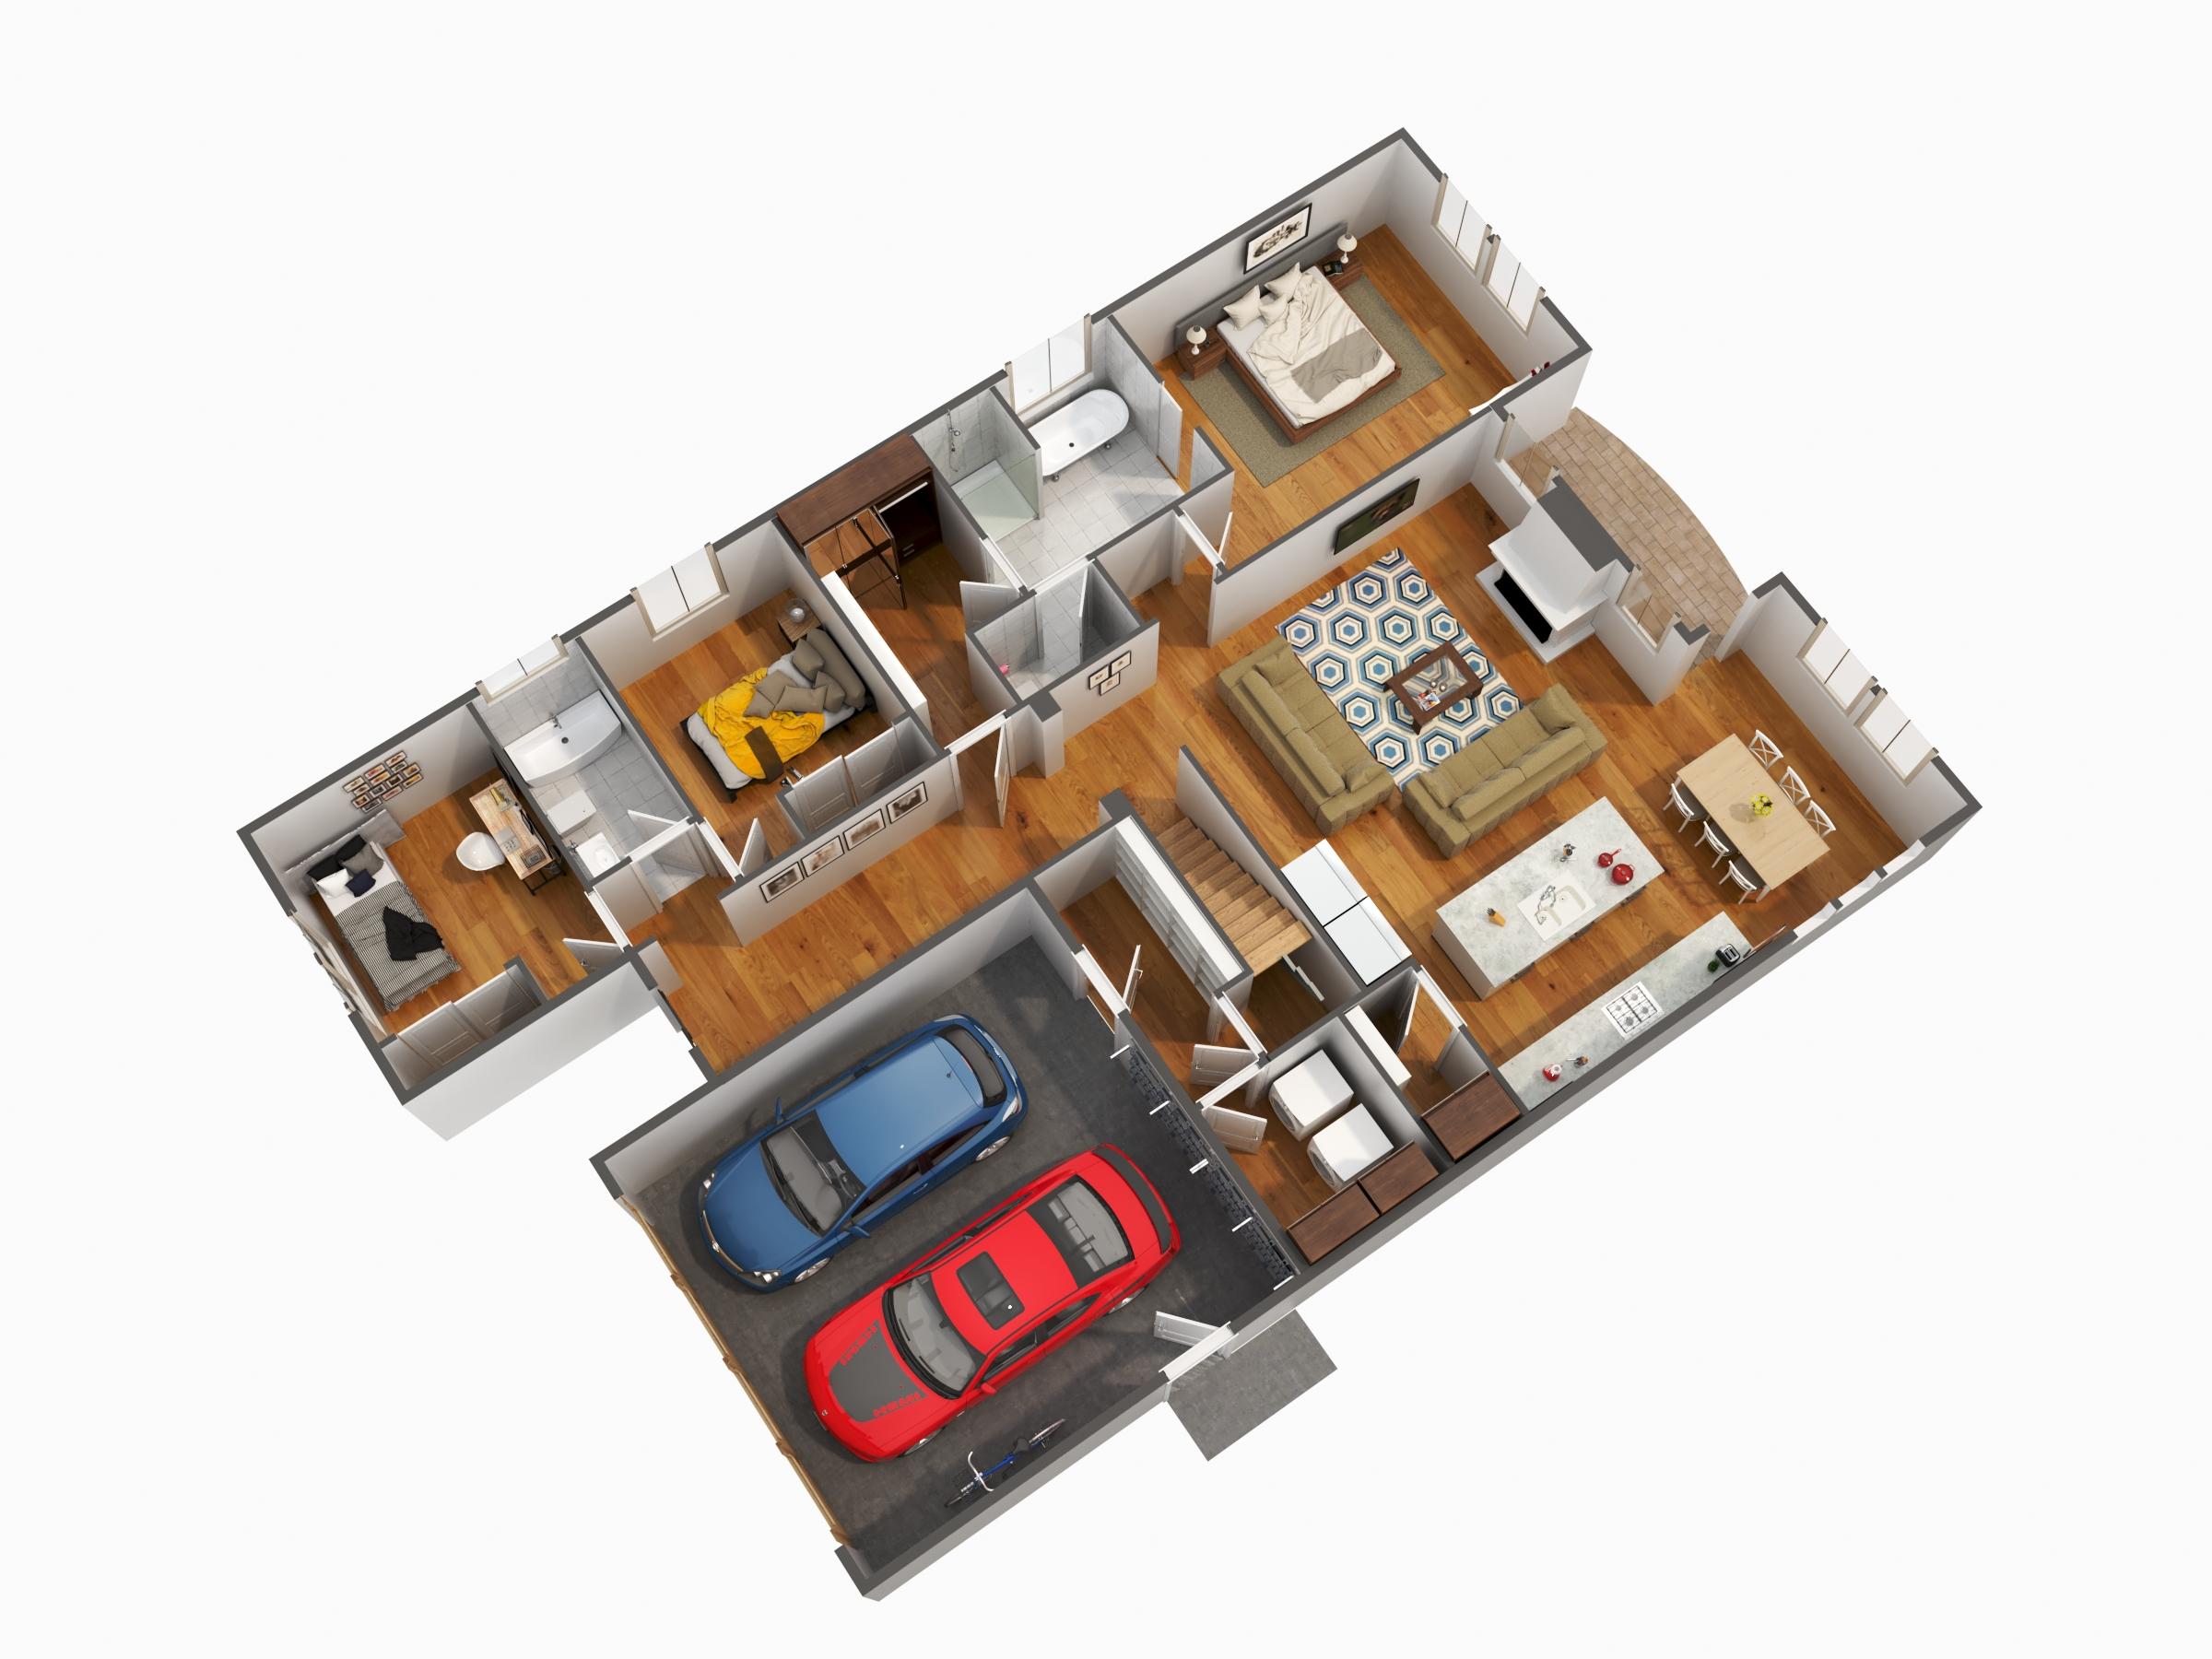 yellowstone_floorplan.jpg